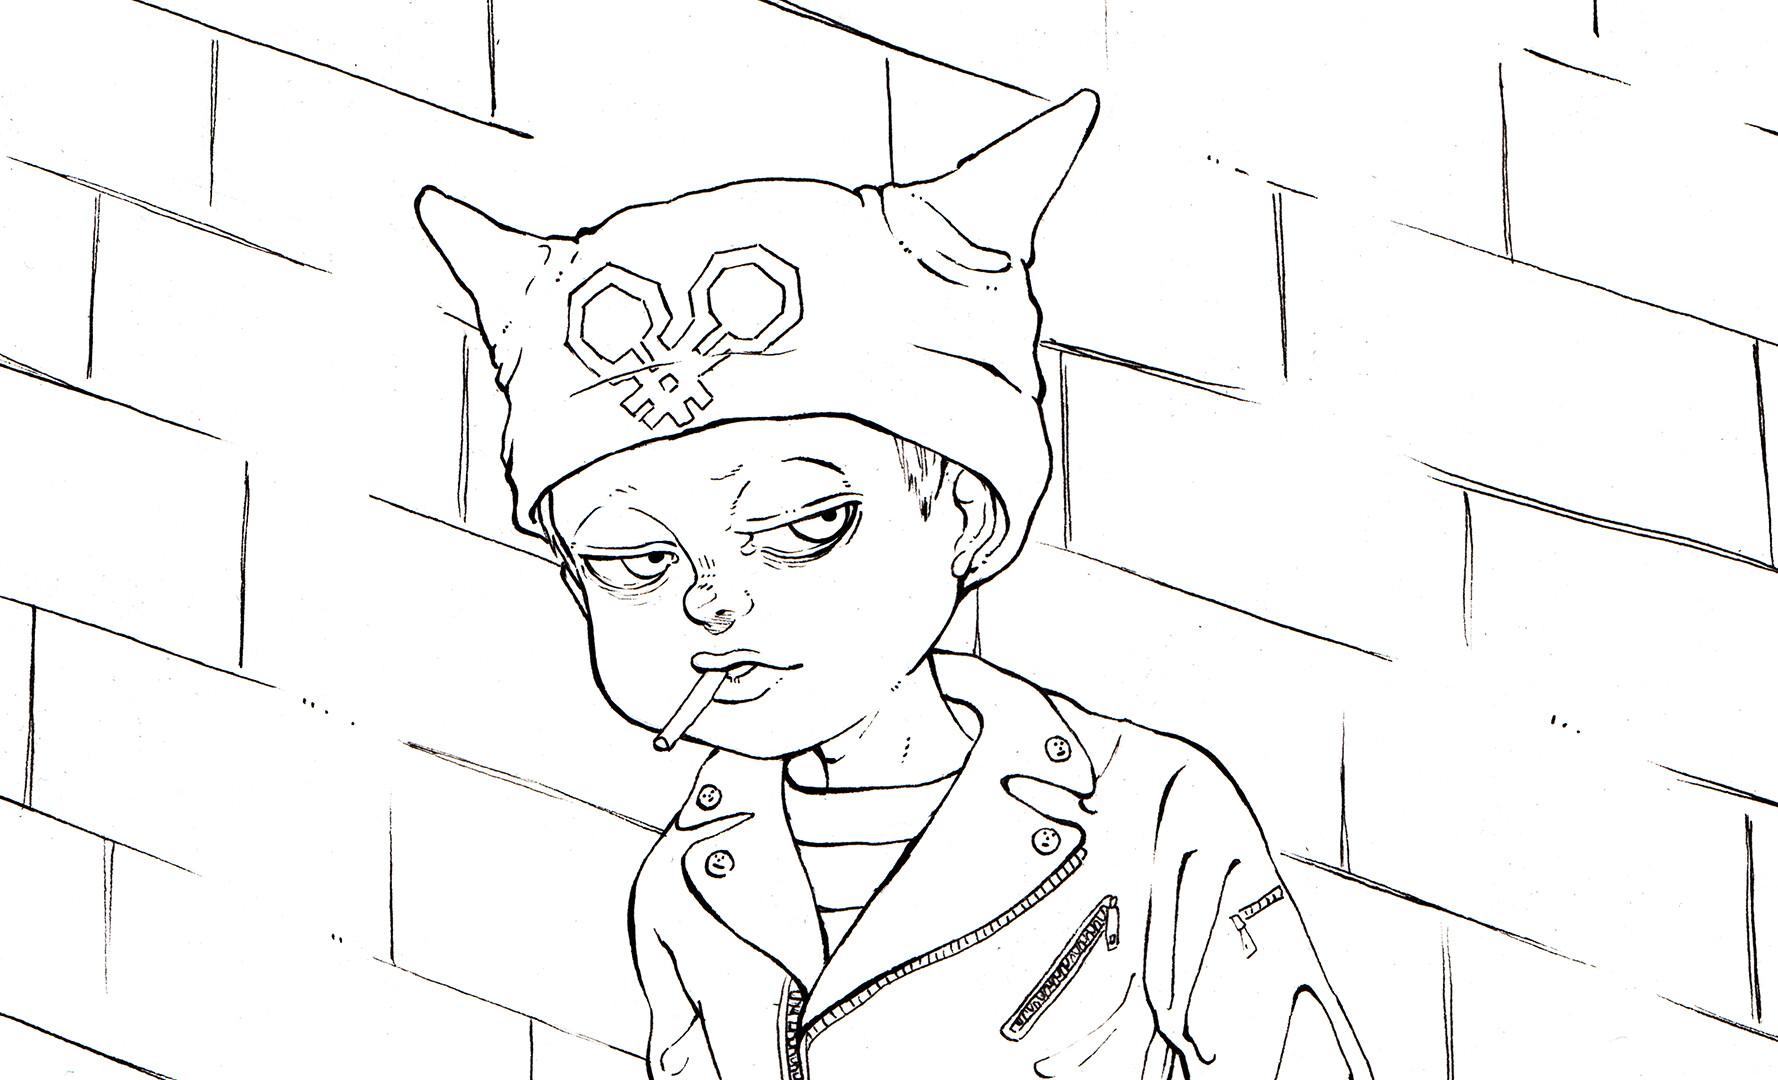 Artstation Ryoma Hoshi Danganronpa V3 Fanart Pauline Callenaere Zerochan has 201 hoshi ryouma anime images, wallpapers, fanart, cosplay pictures, and many more in its gallery. danganronpa v3 fanart pauline callenaere